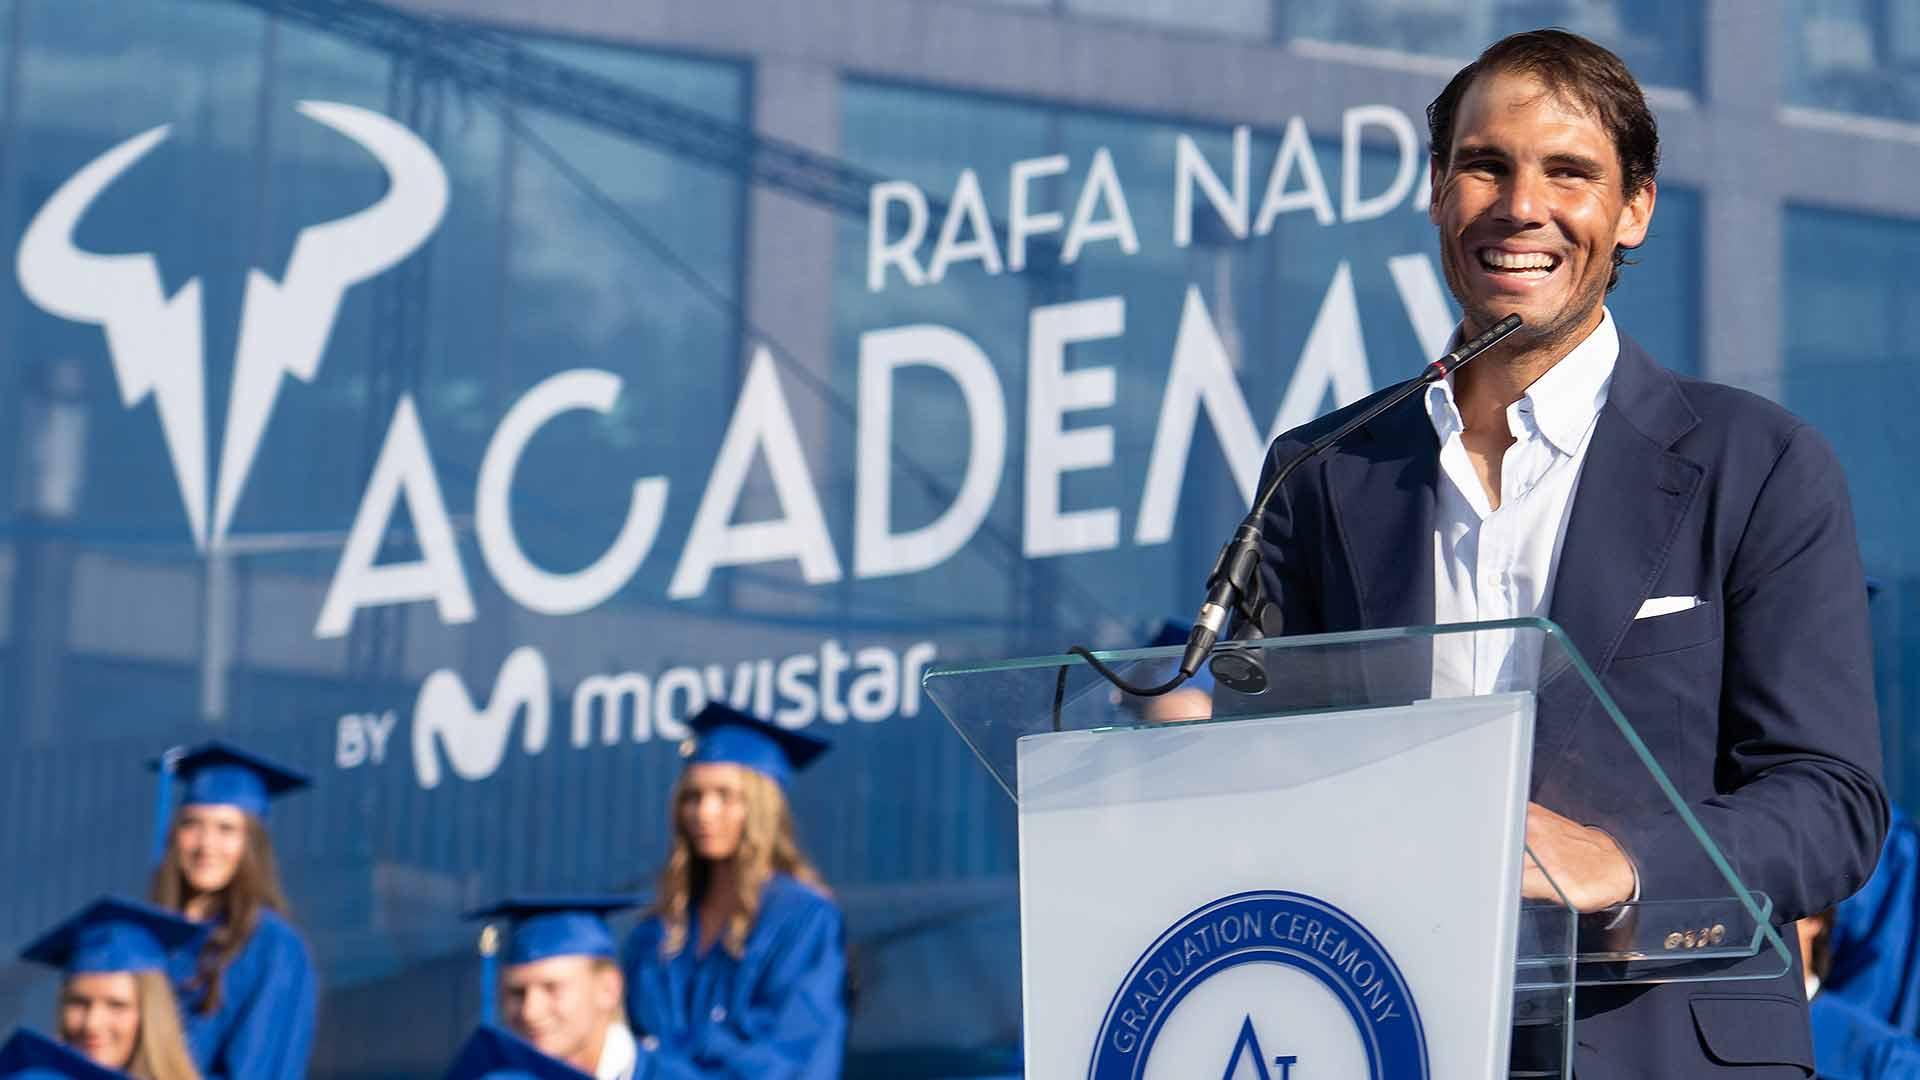 Rafael Nadal, David Ferrer Offer Wisdom To Academy Graduating Class | ATP Tour | Tennis